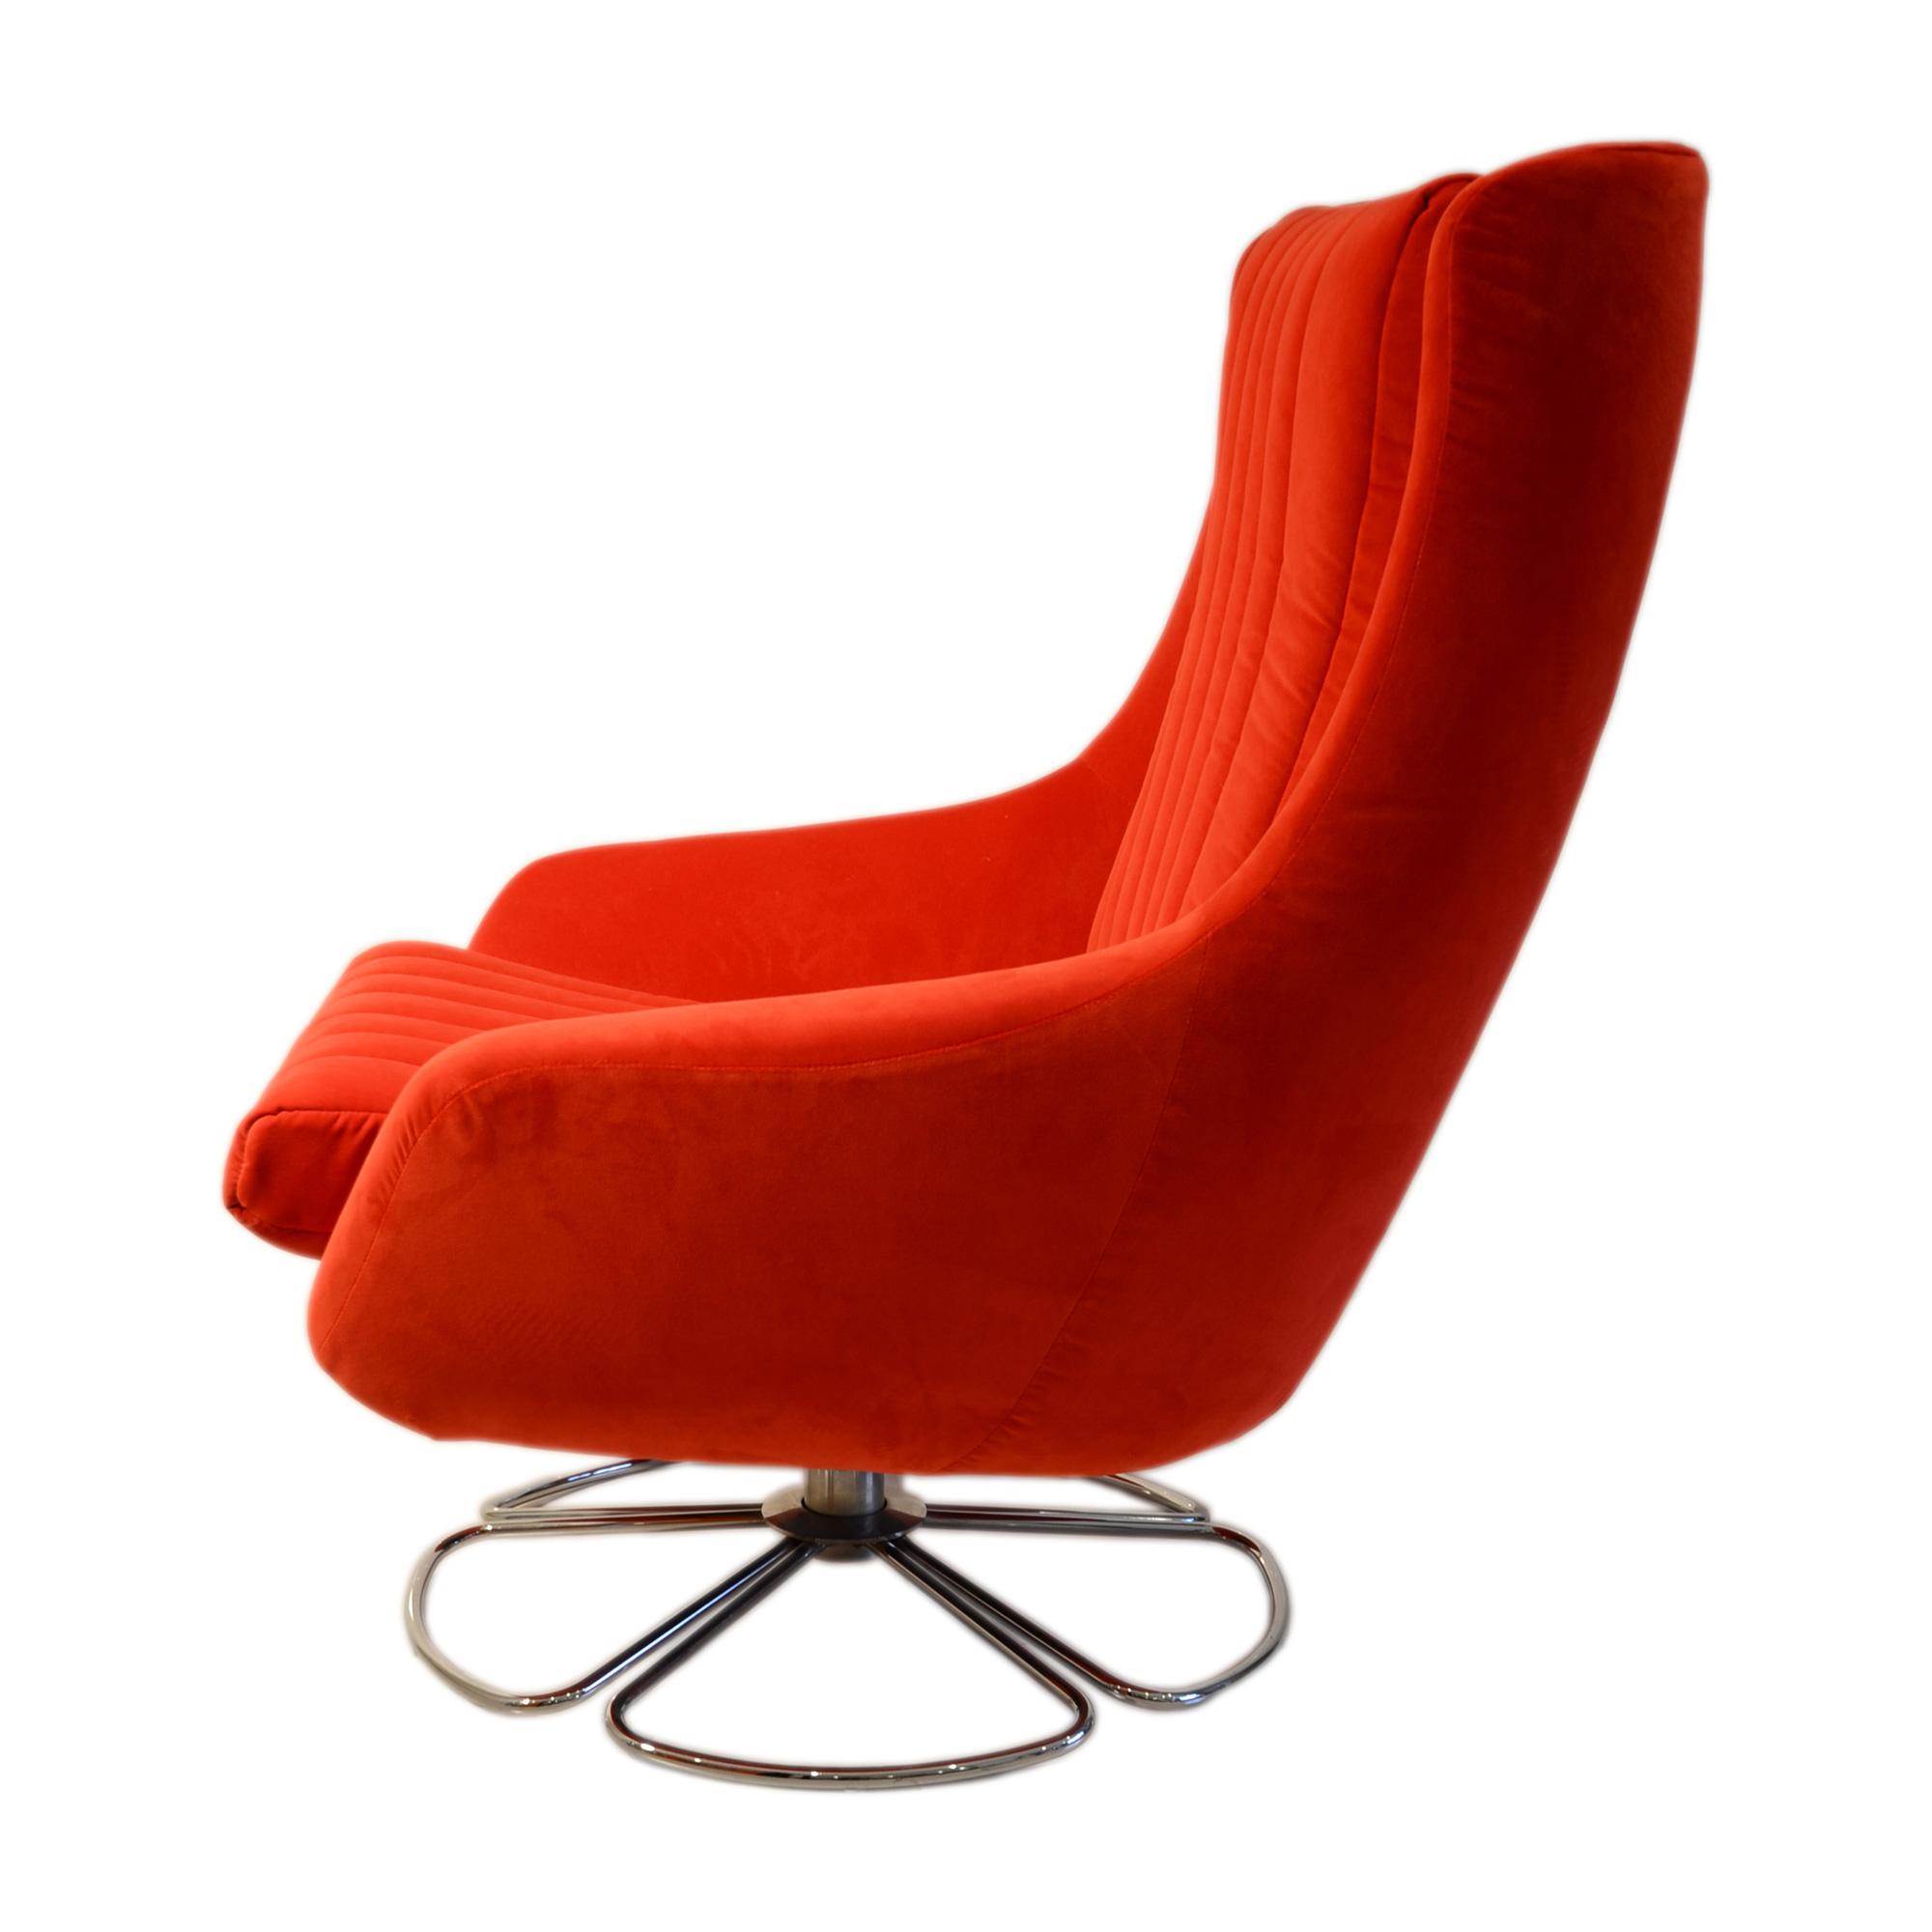 side view portobello chair red swivel egg